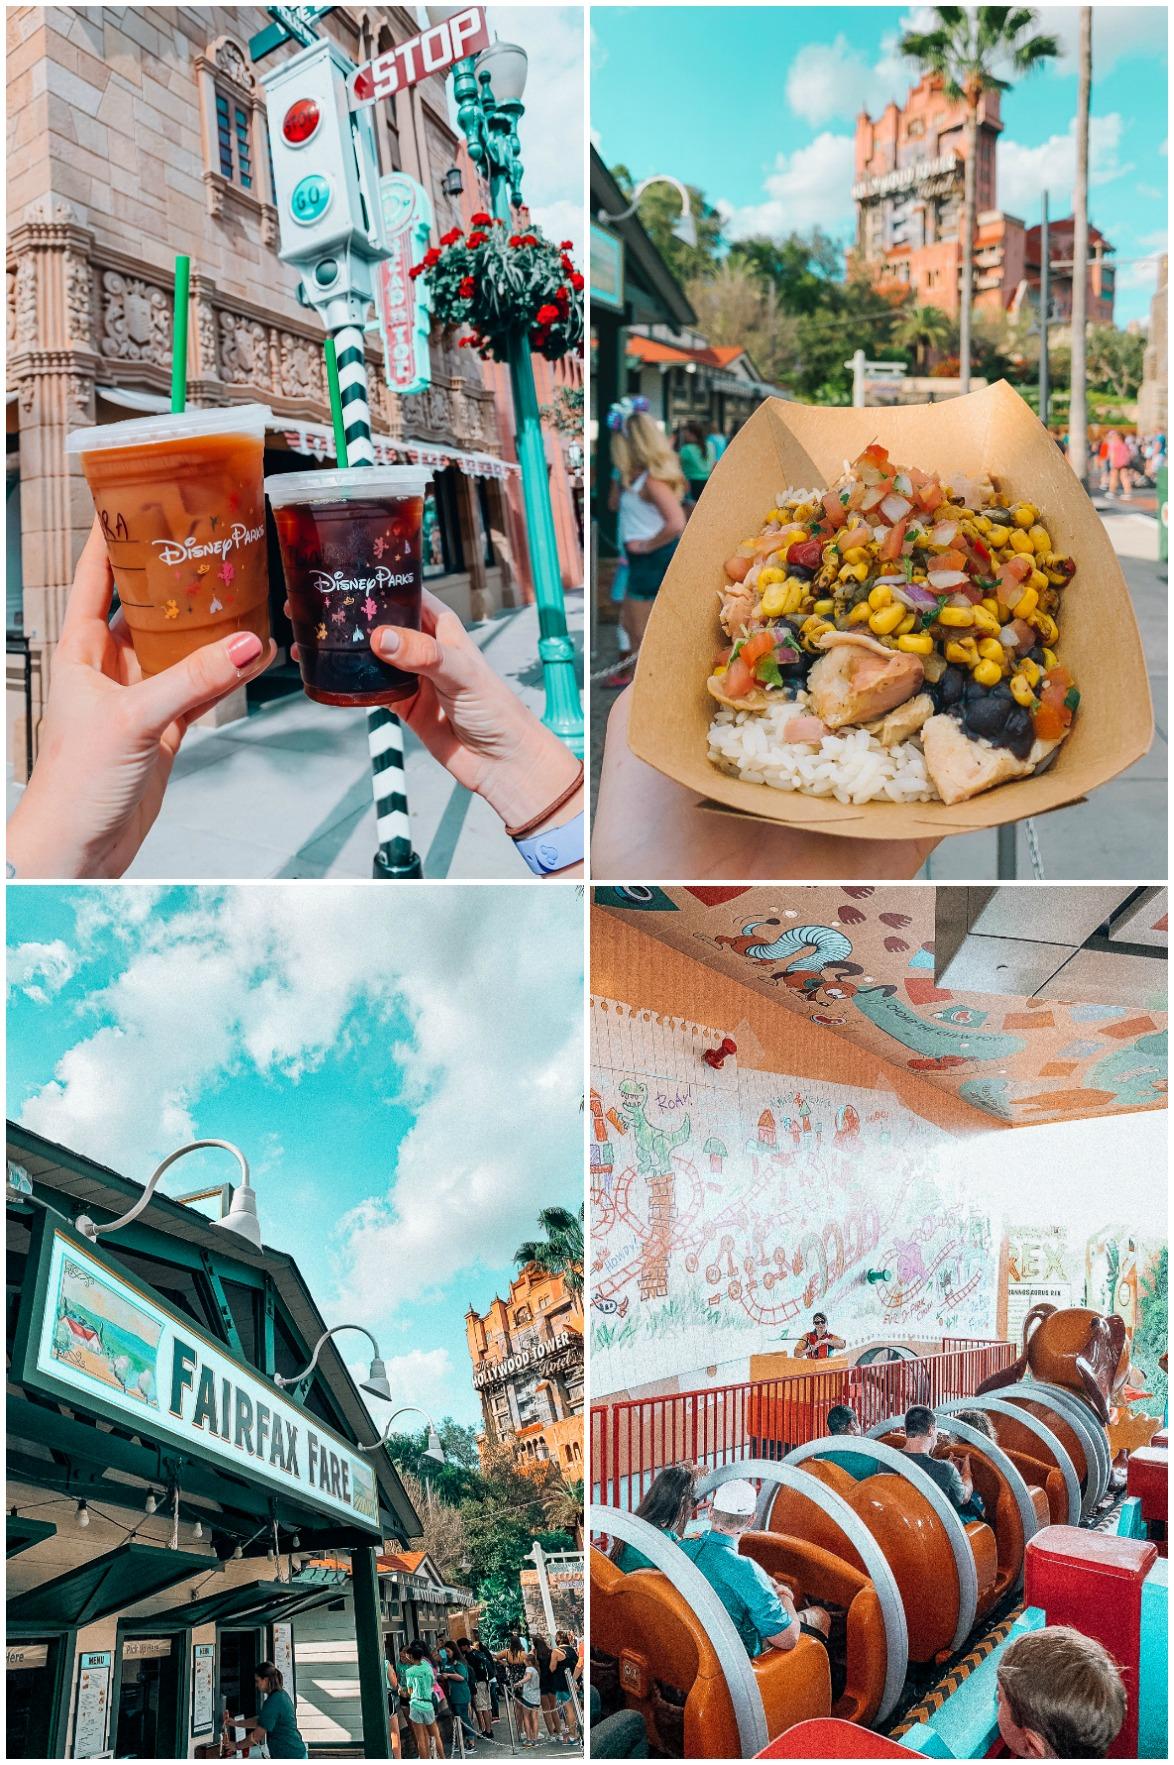 Toy story land Disney Walt Disney World Itinerary Hollywood Studios gluten free dairy free vegan food options Fairfax